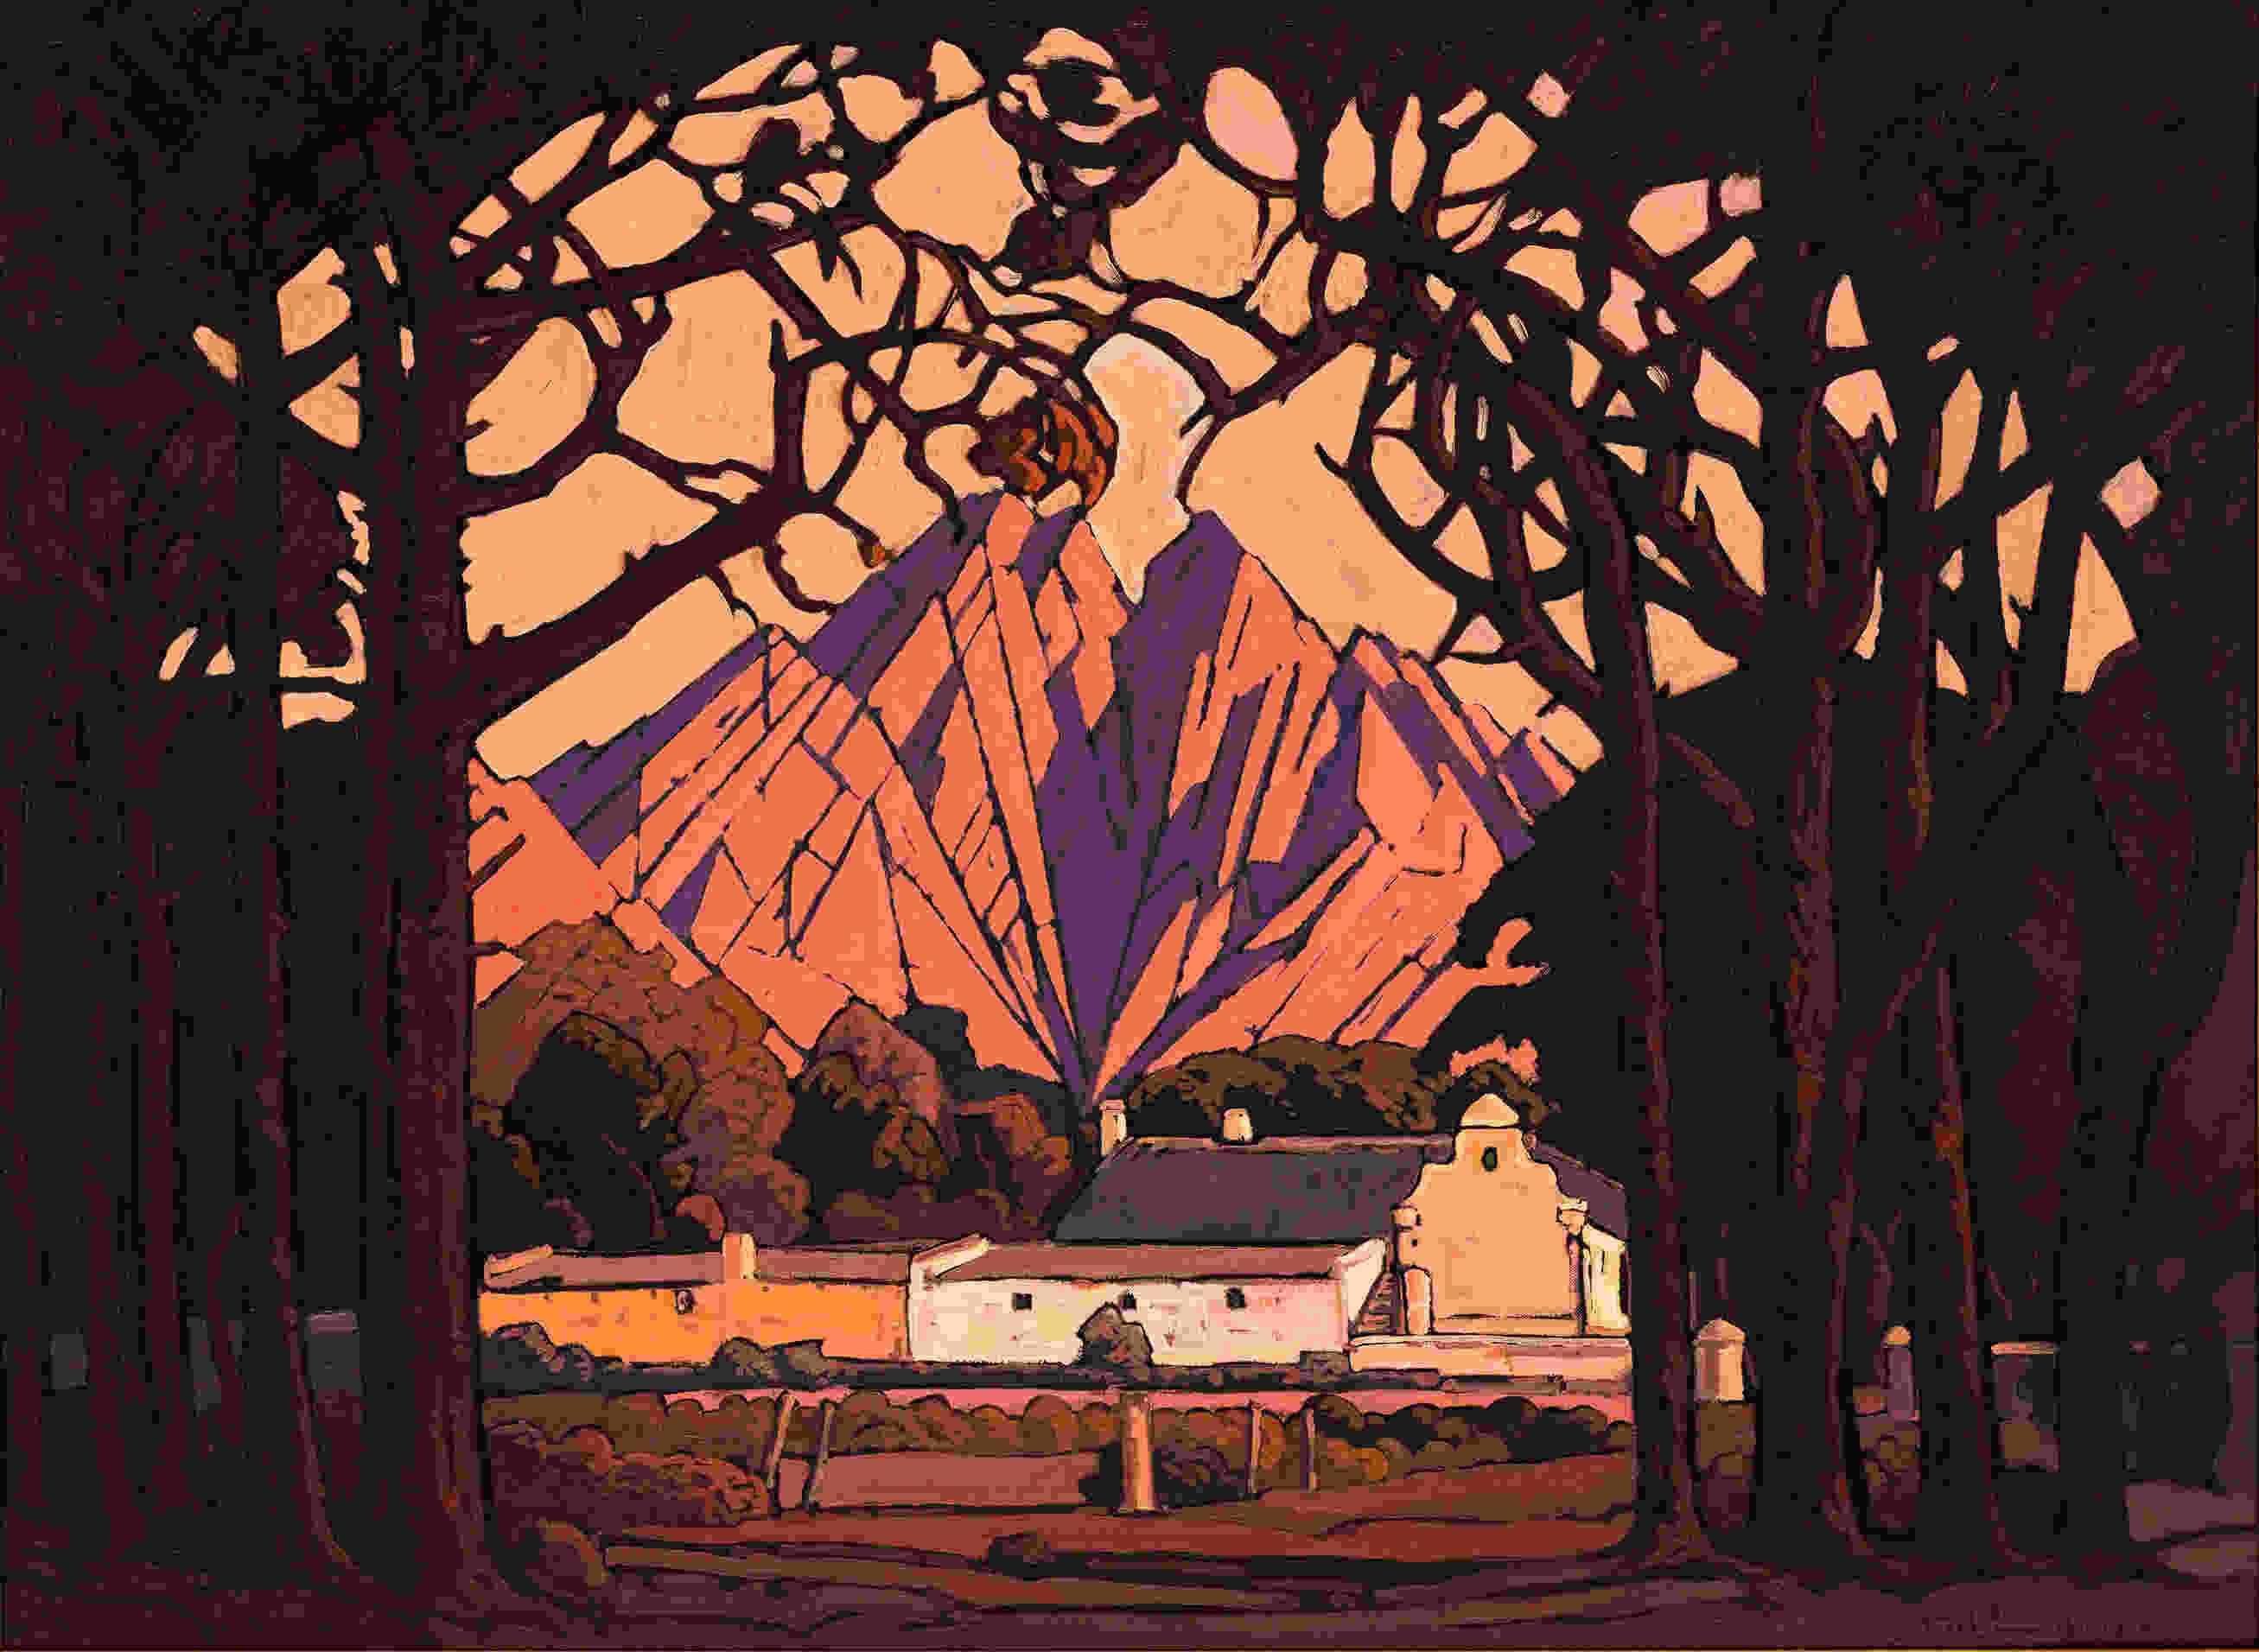 Jacob Hendrik Pierneef, Boerderij in de Jonkershoekvallei, Stellenbosch, 1928, olieverf op doek, 73,5 x 100,5 cm